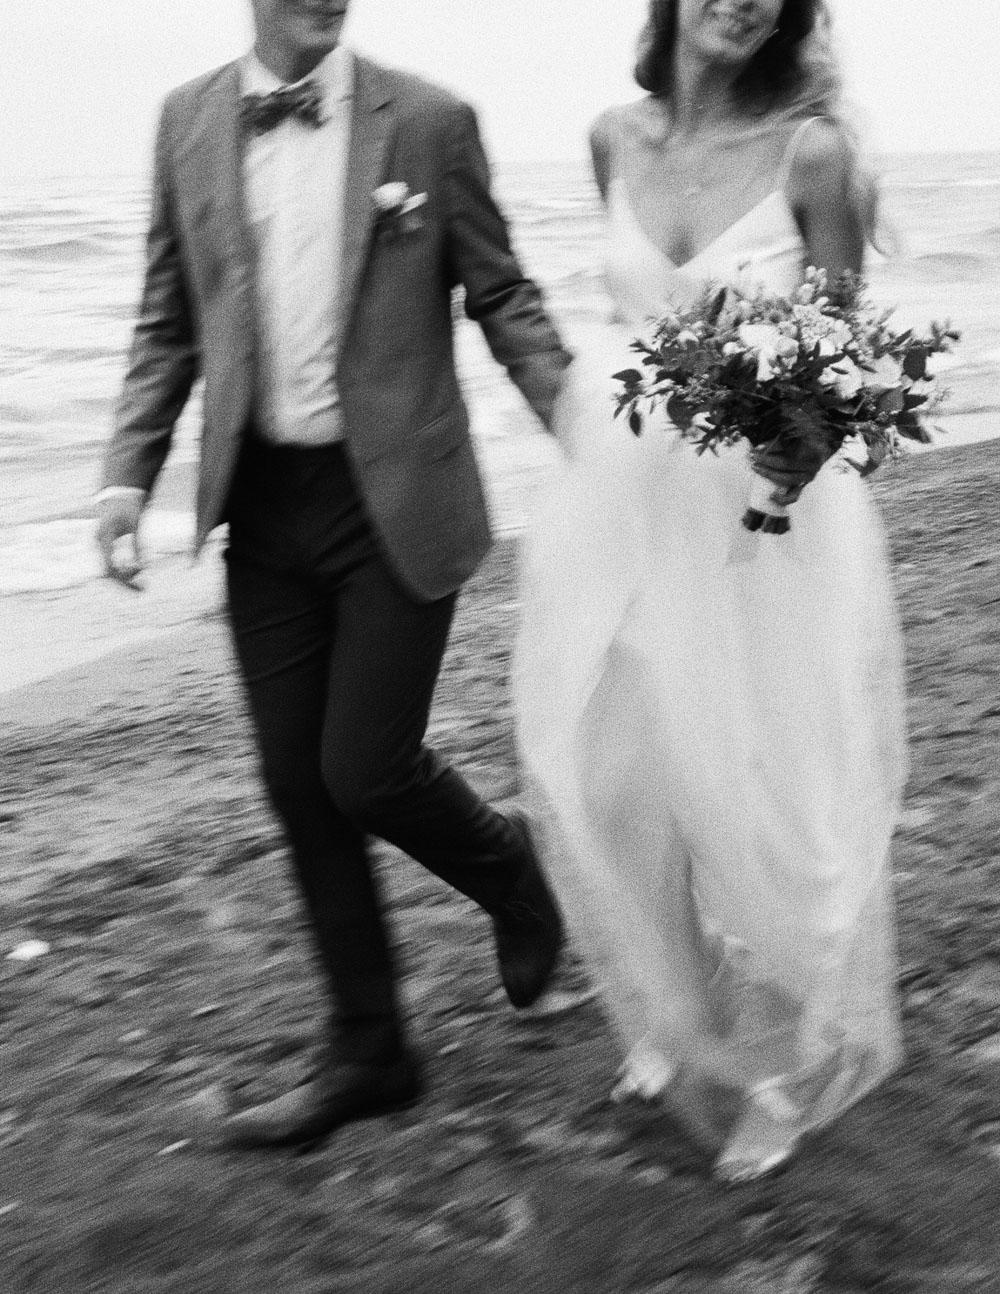 couple walking on beach.jpg